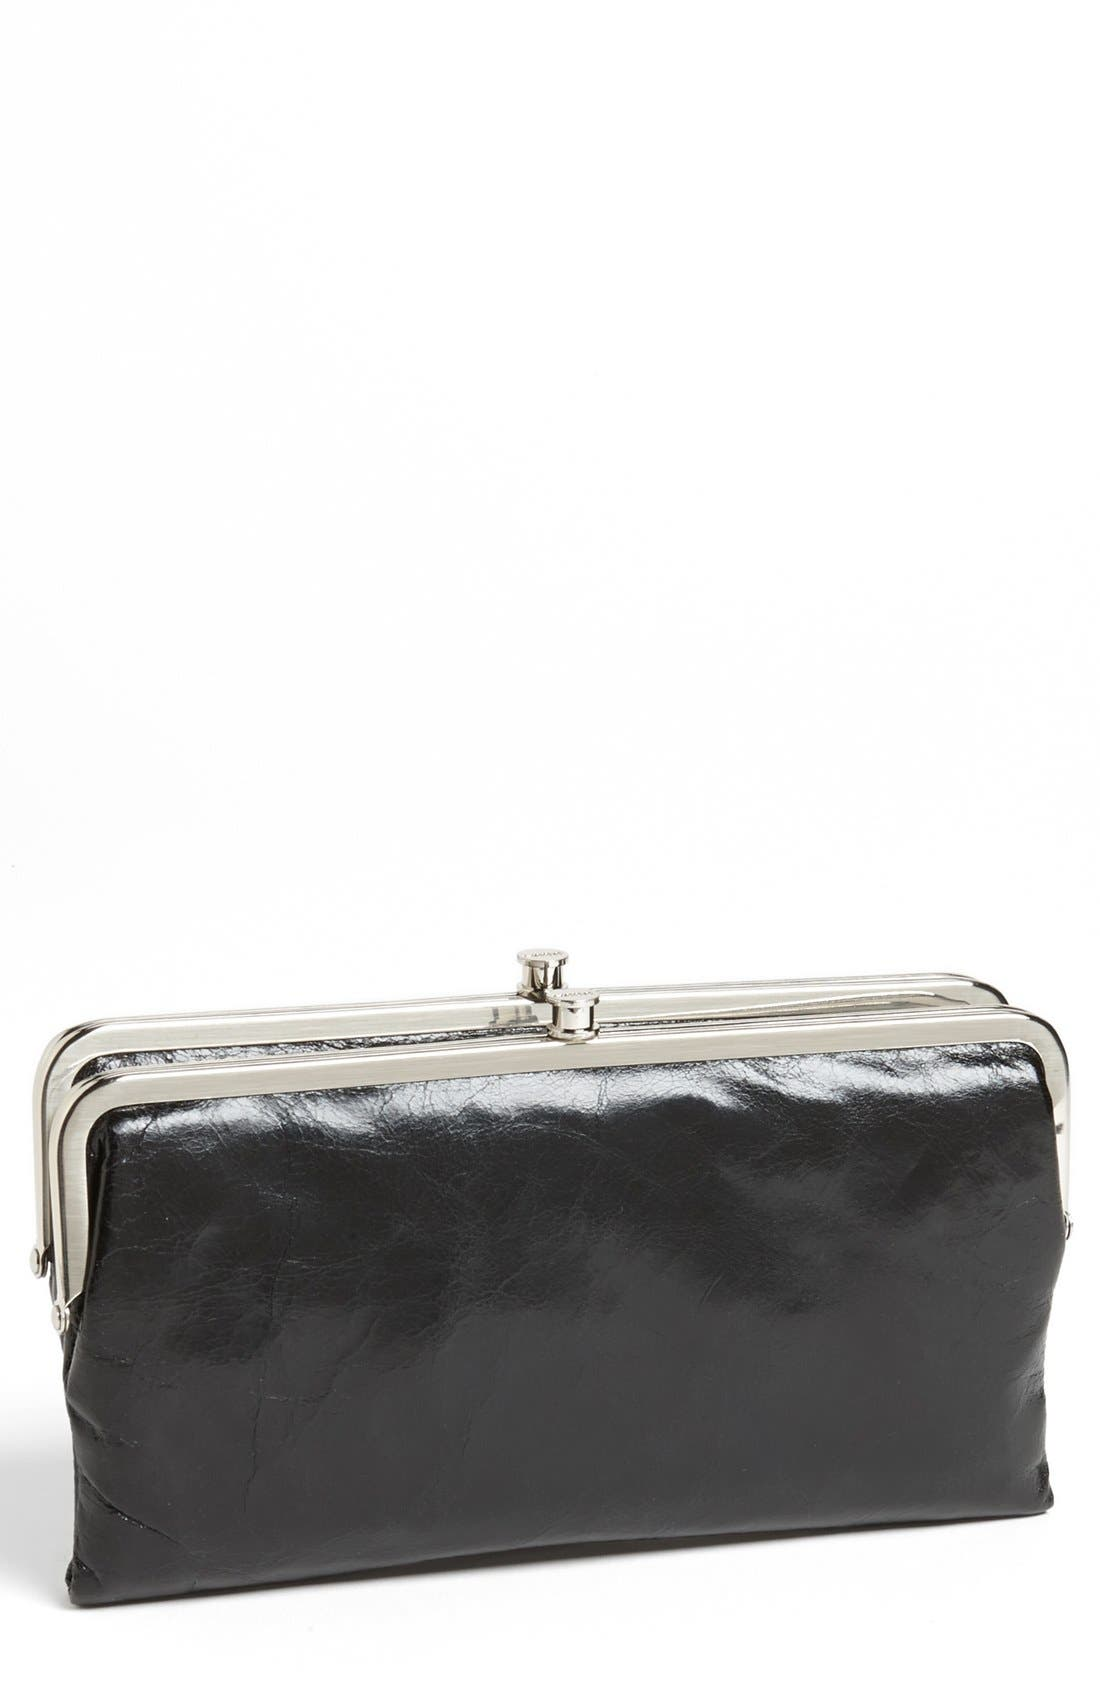 Main Image - Hobo 'Lauren' Leather Double Frame Clutch